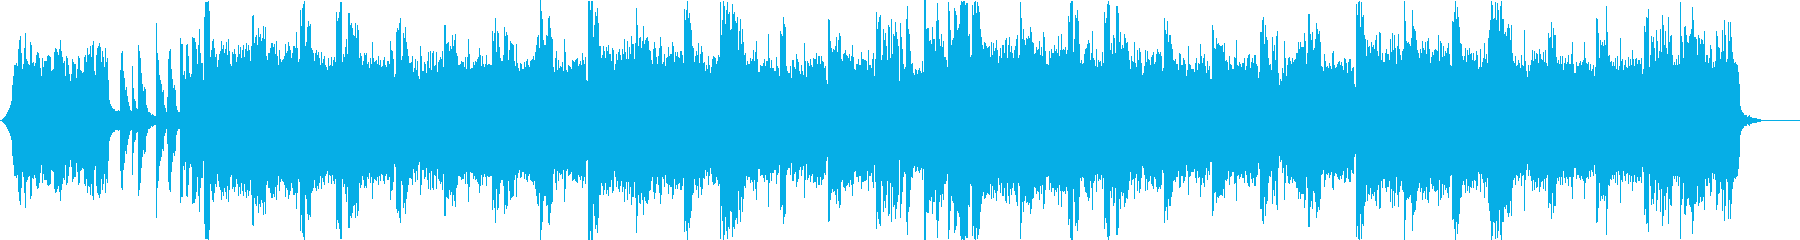 eスポーツ大会 EDM 30秒オケのみの再生済みの波形